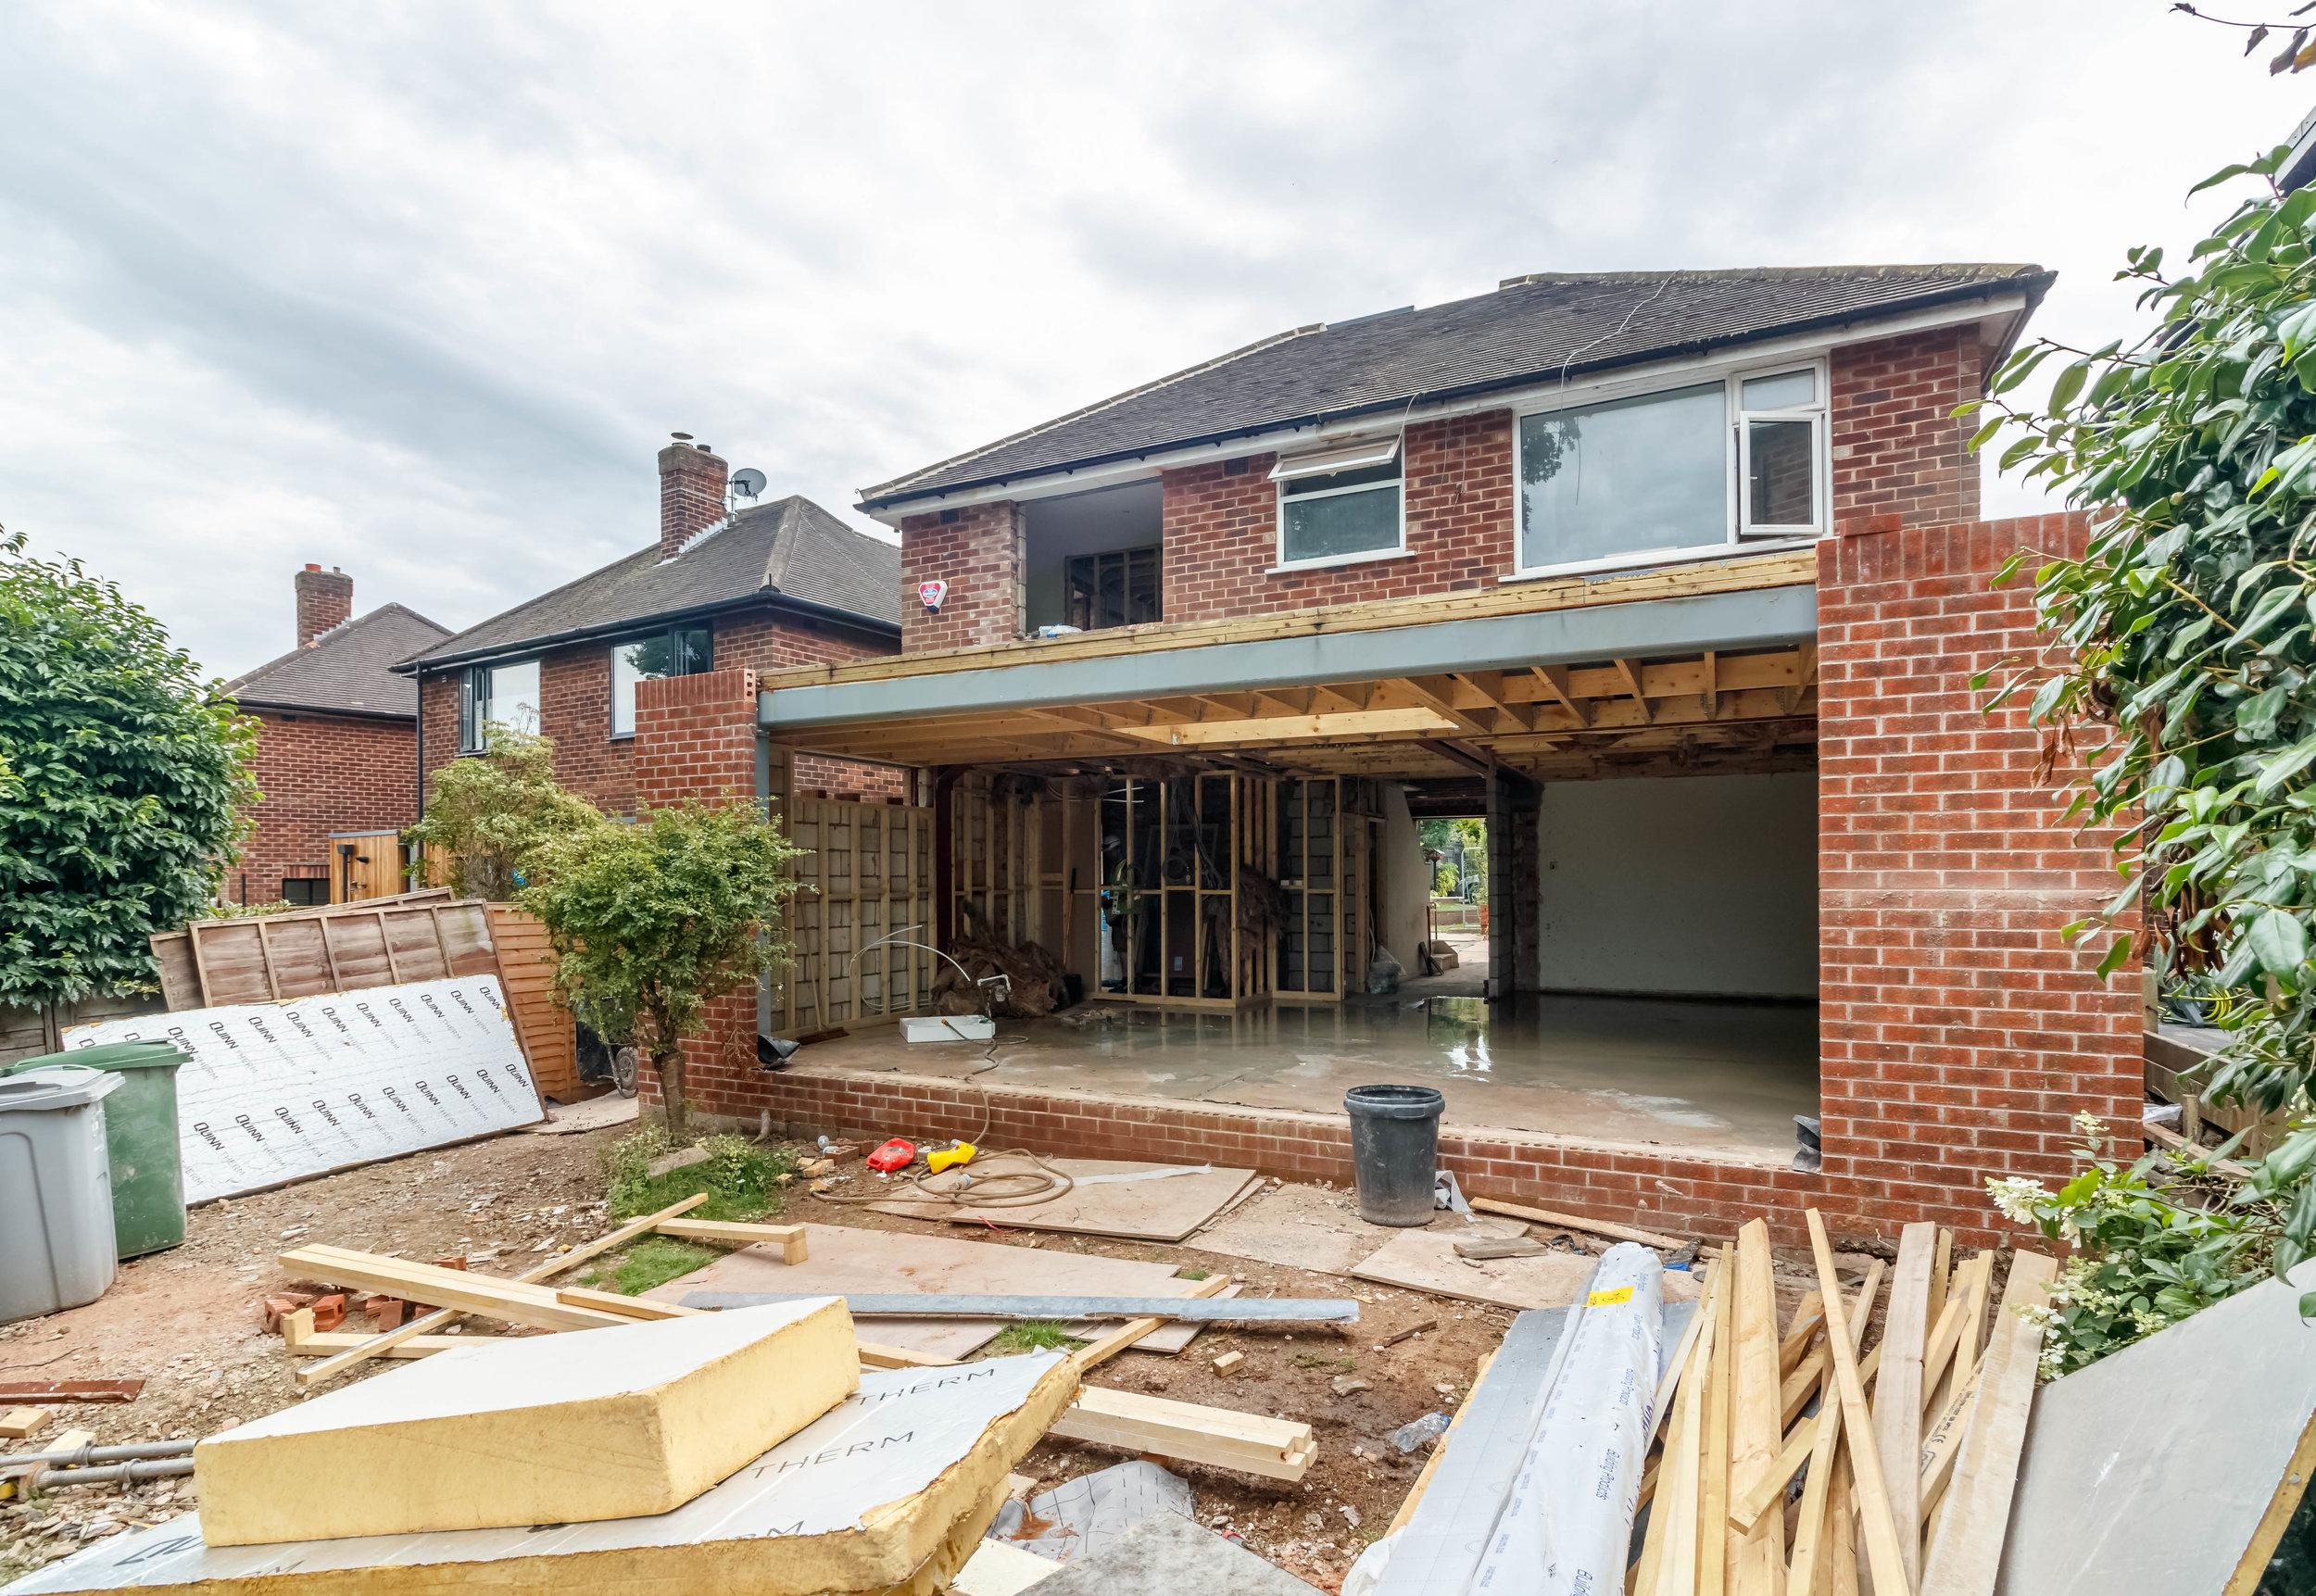 PropertyPhotographs 05176.jpg